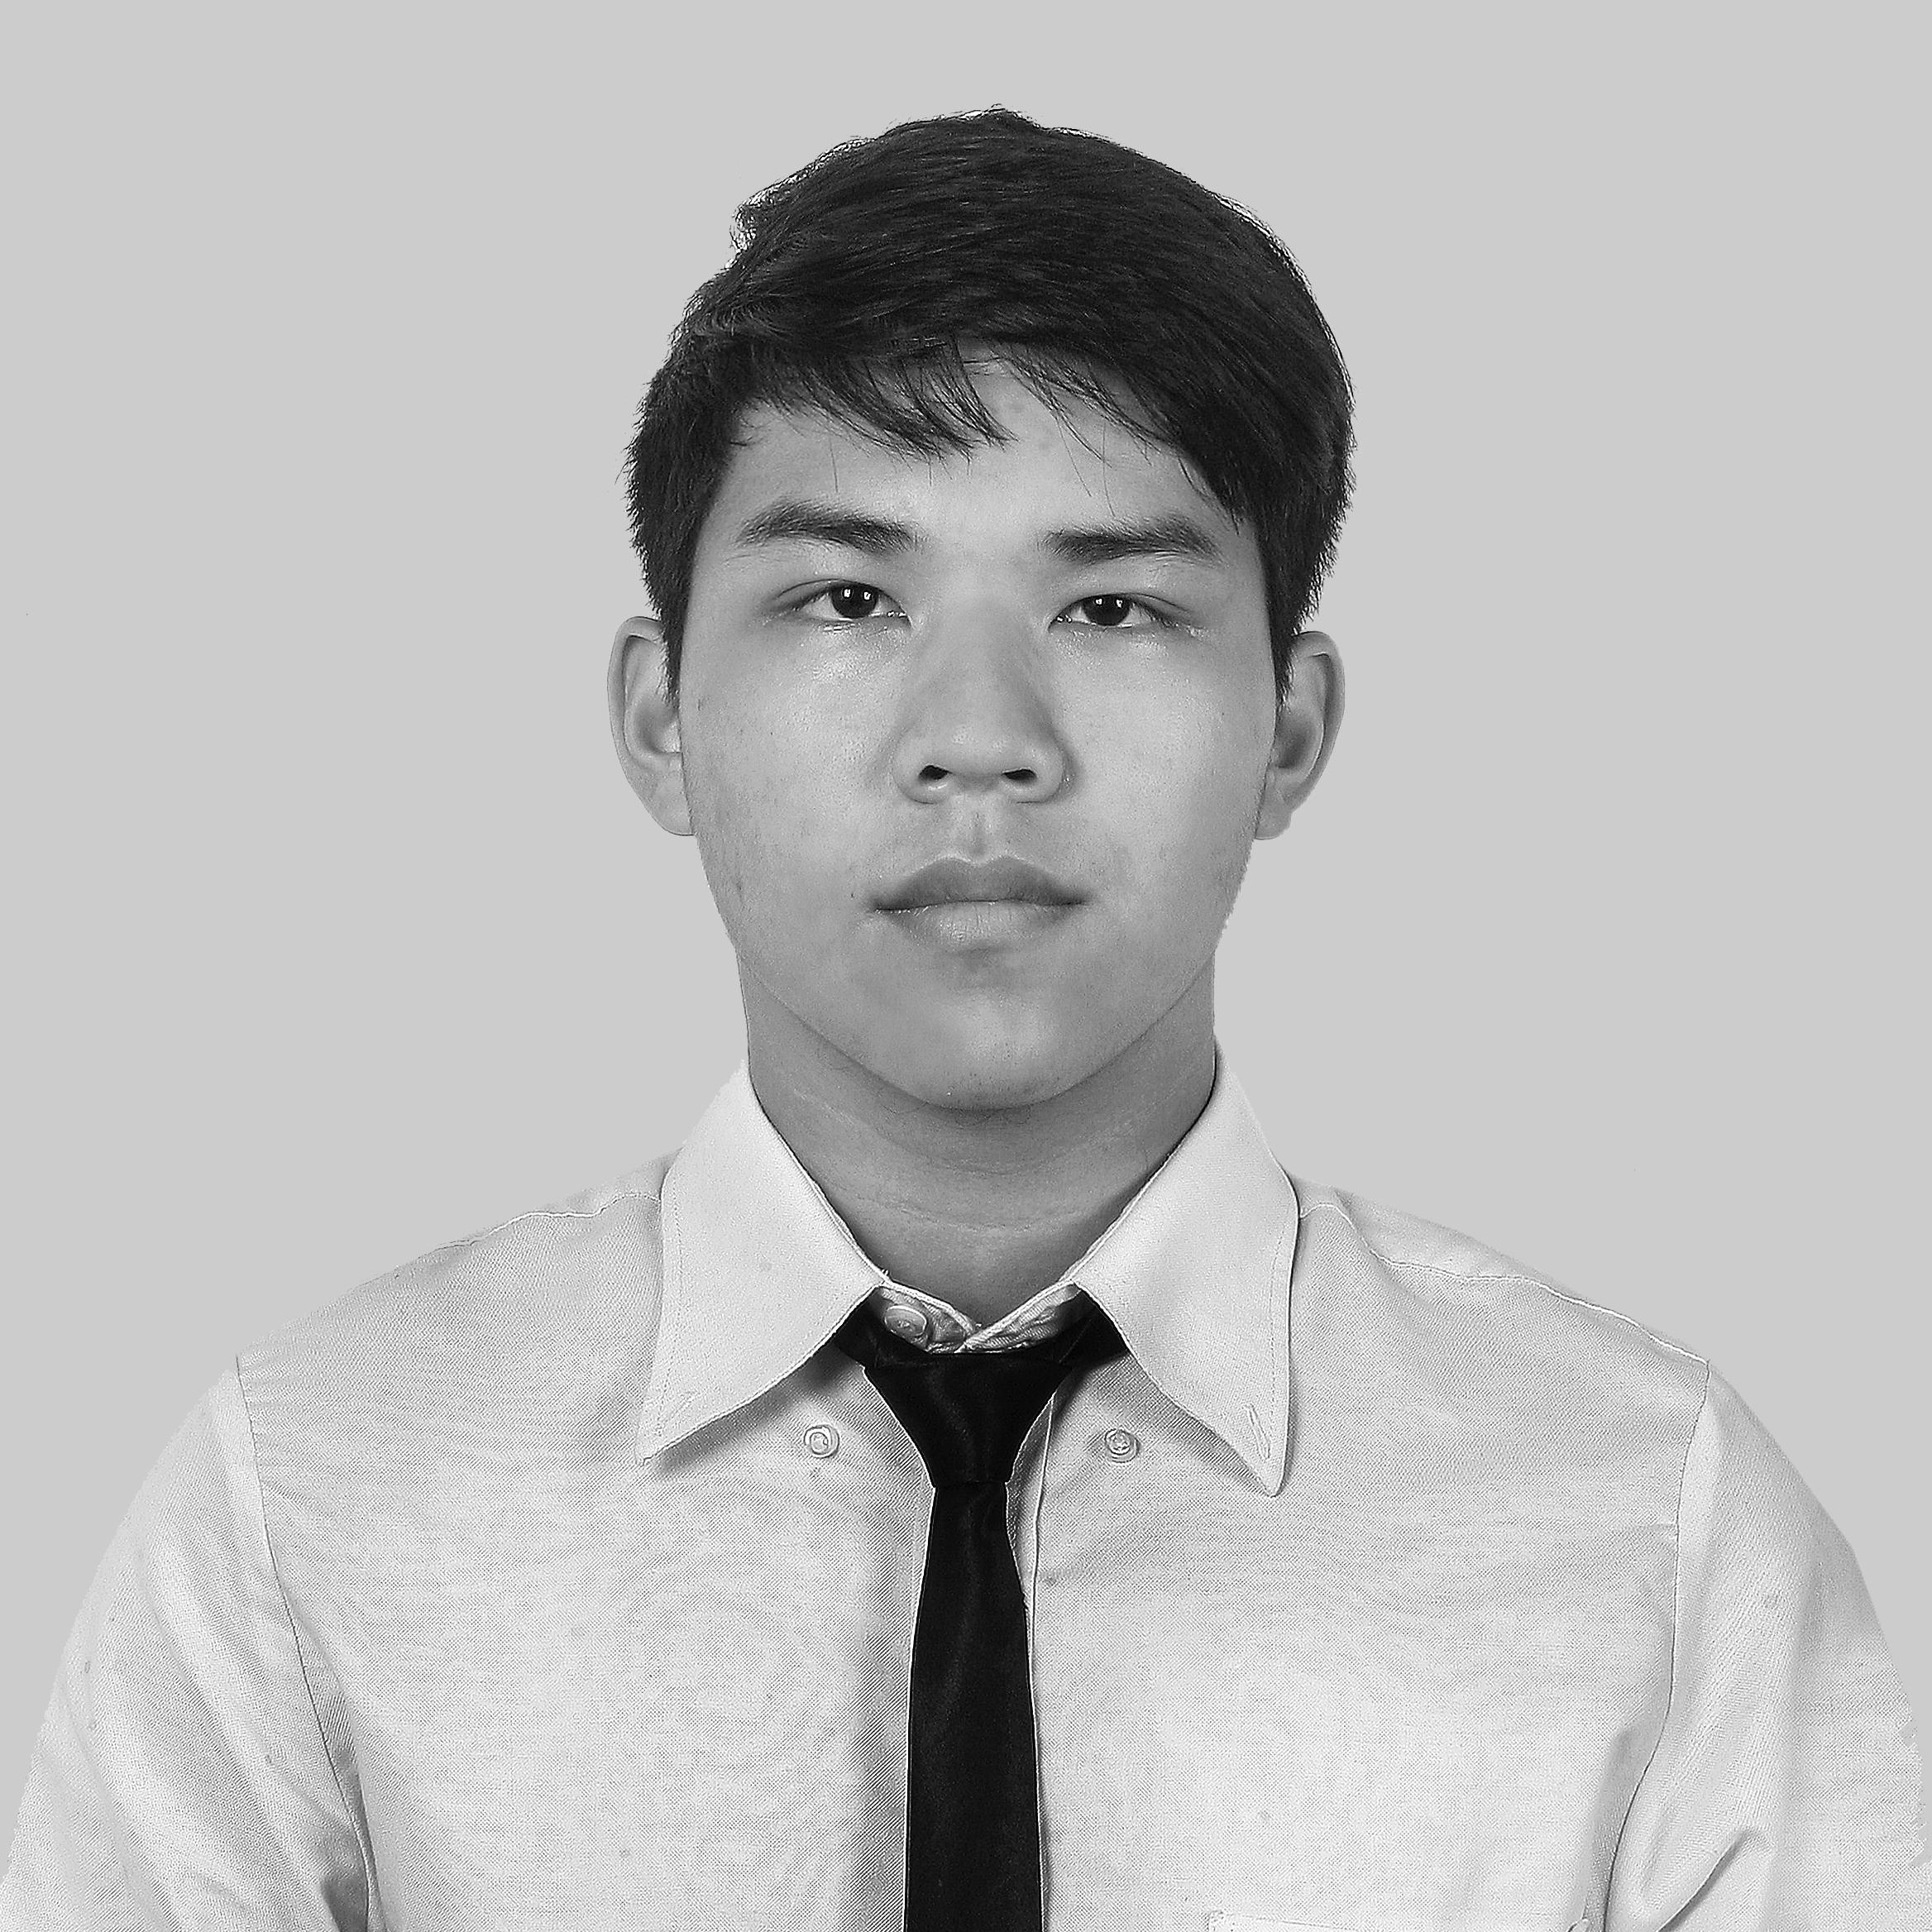 Nguyễn Hải Long - 8.0 IELTS